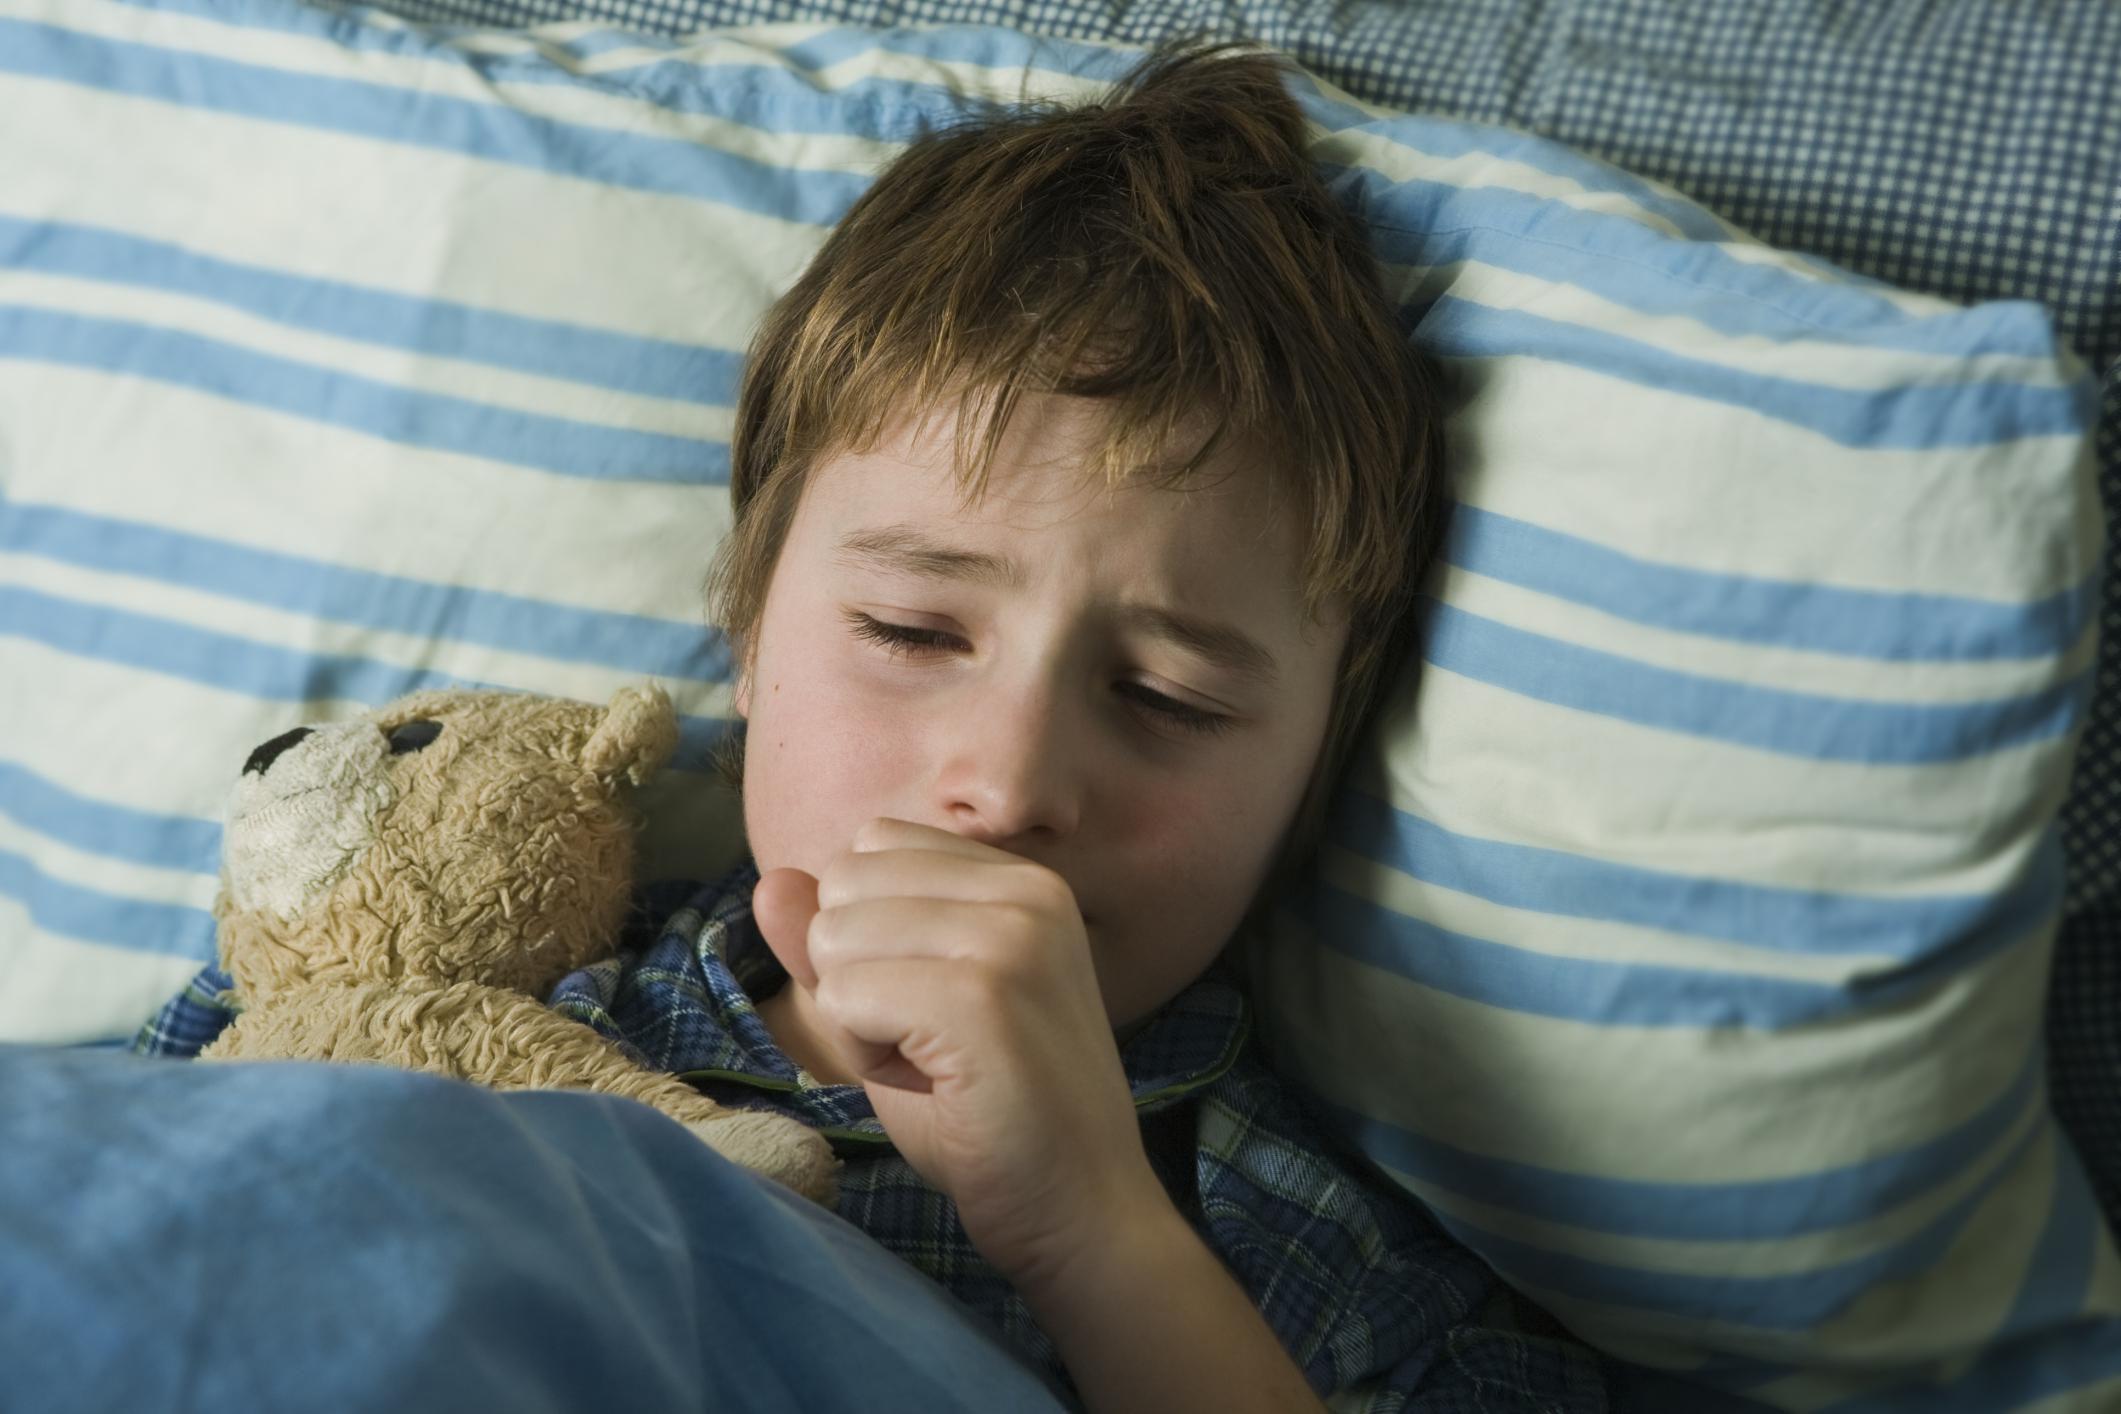 Recognizing Early Flu Symptoms in Children